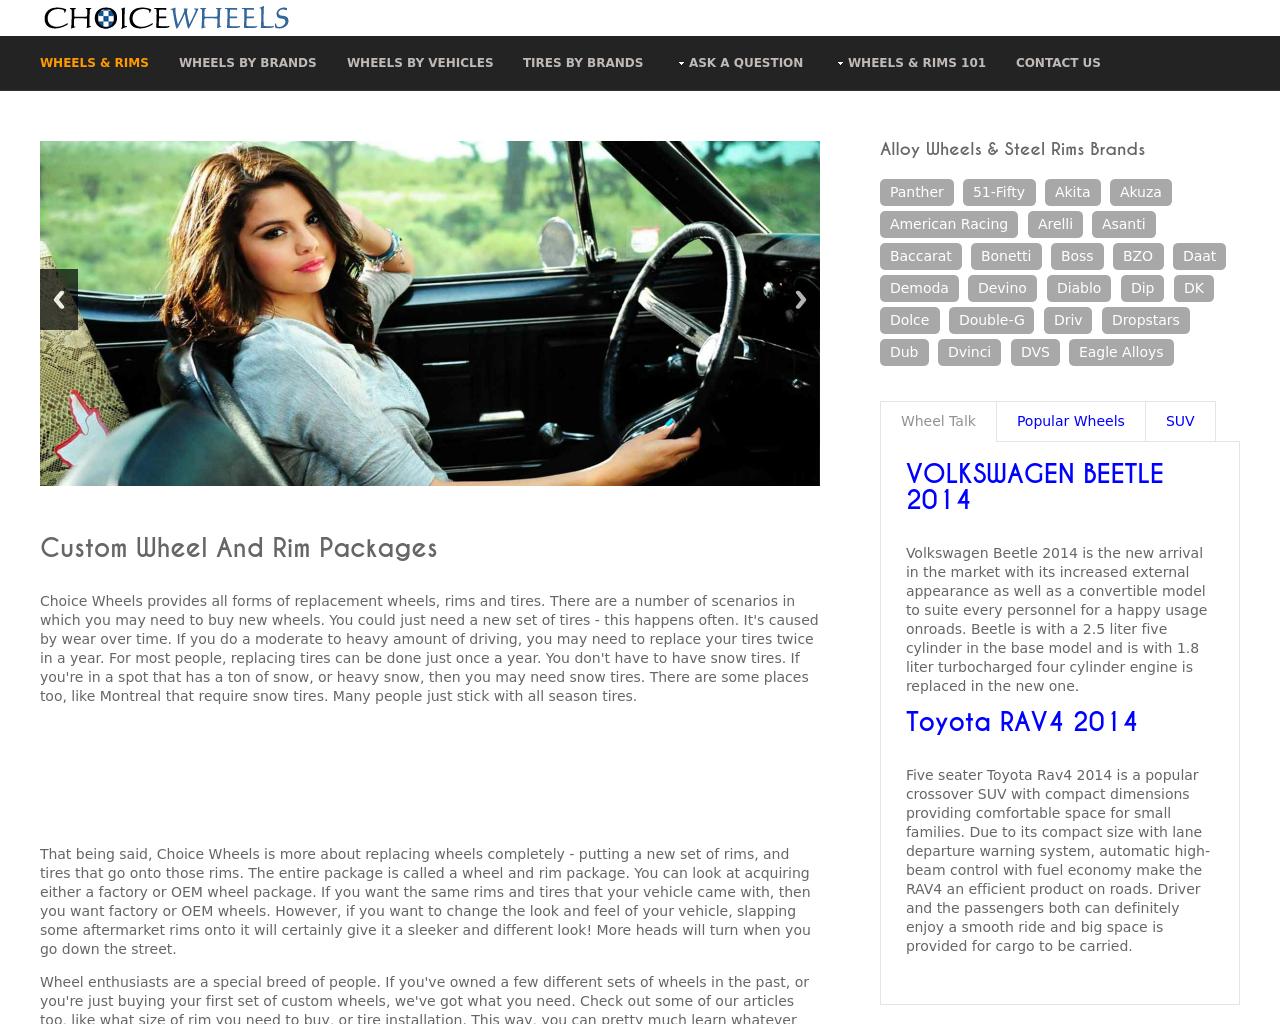 Choice-Wheels-Advertising-Reviews-Pricing